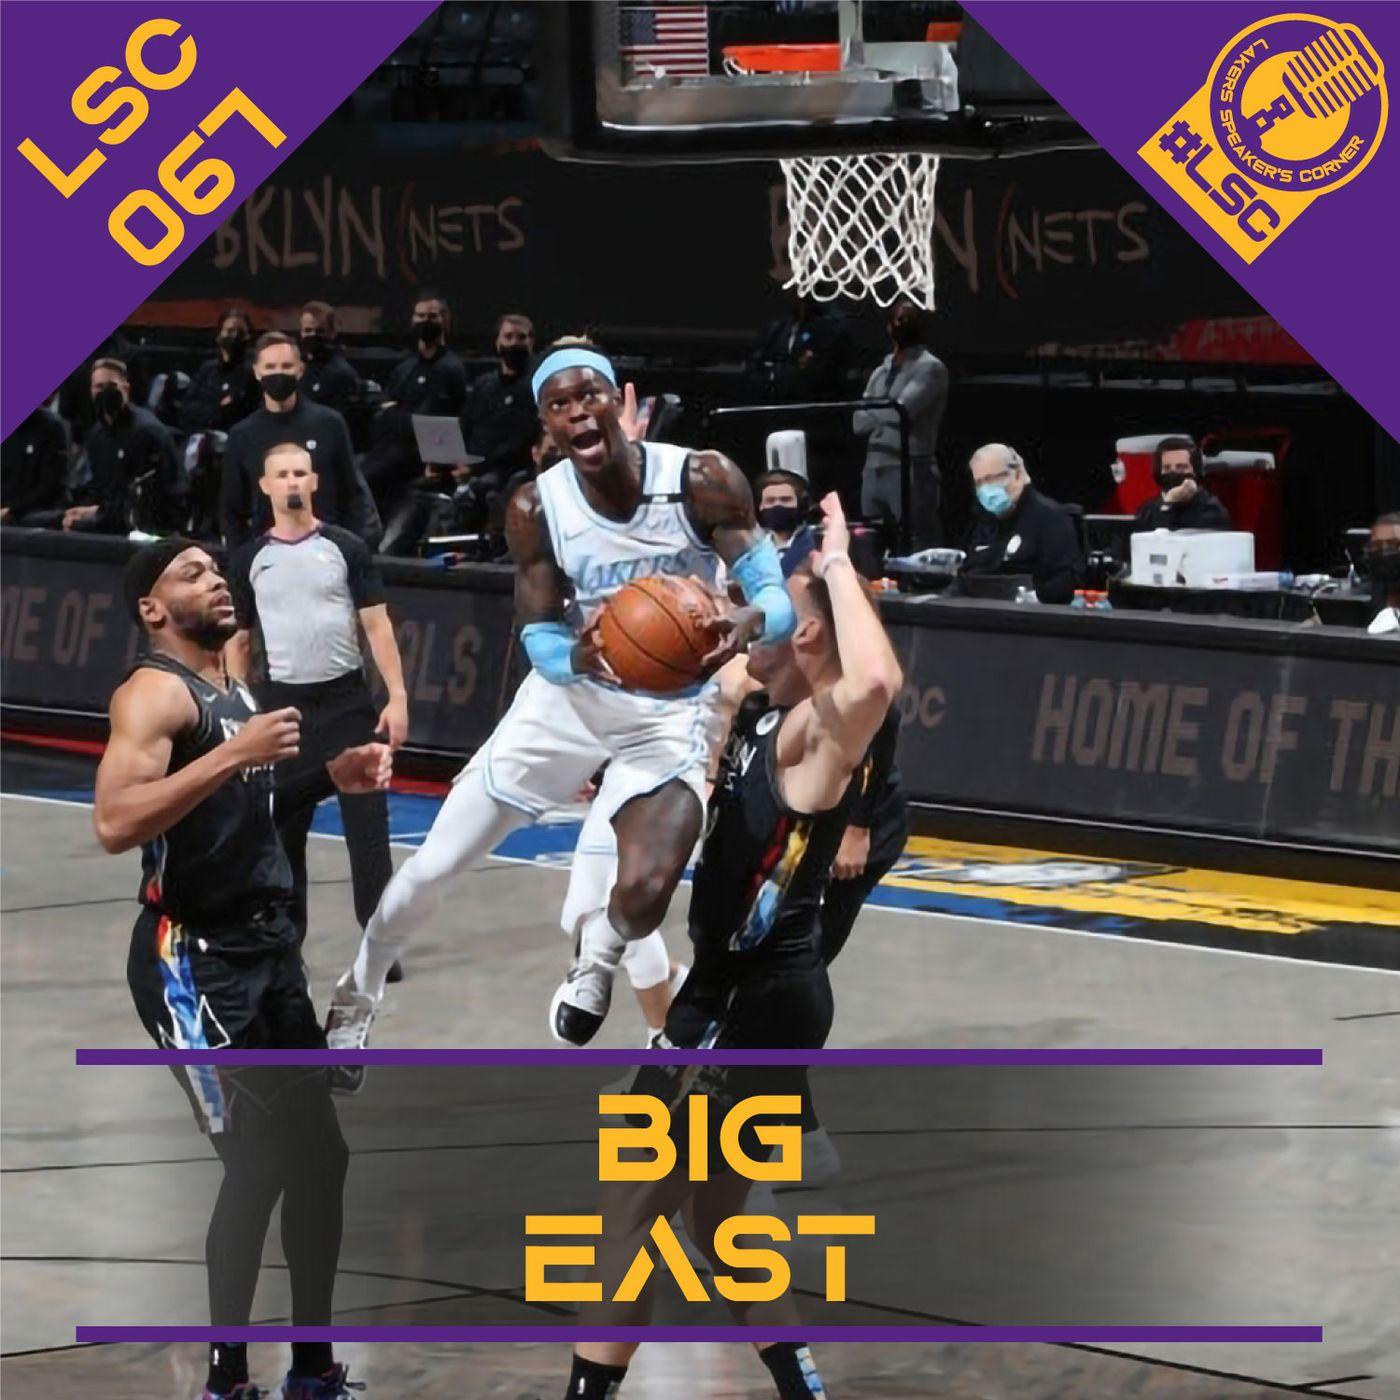 LSC 067 - Big East feat. Andrea Ghezzi